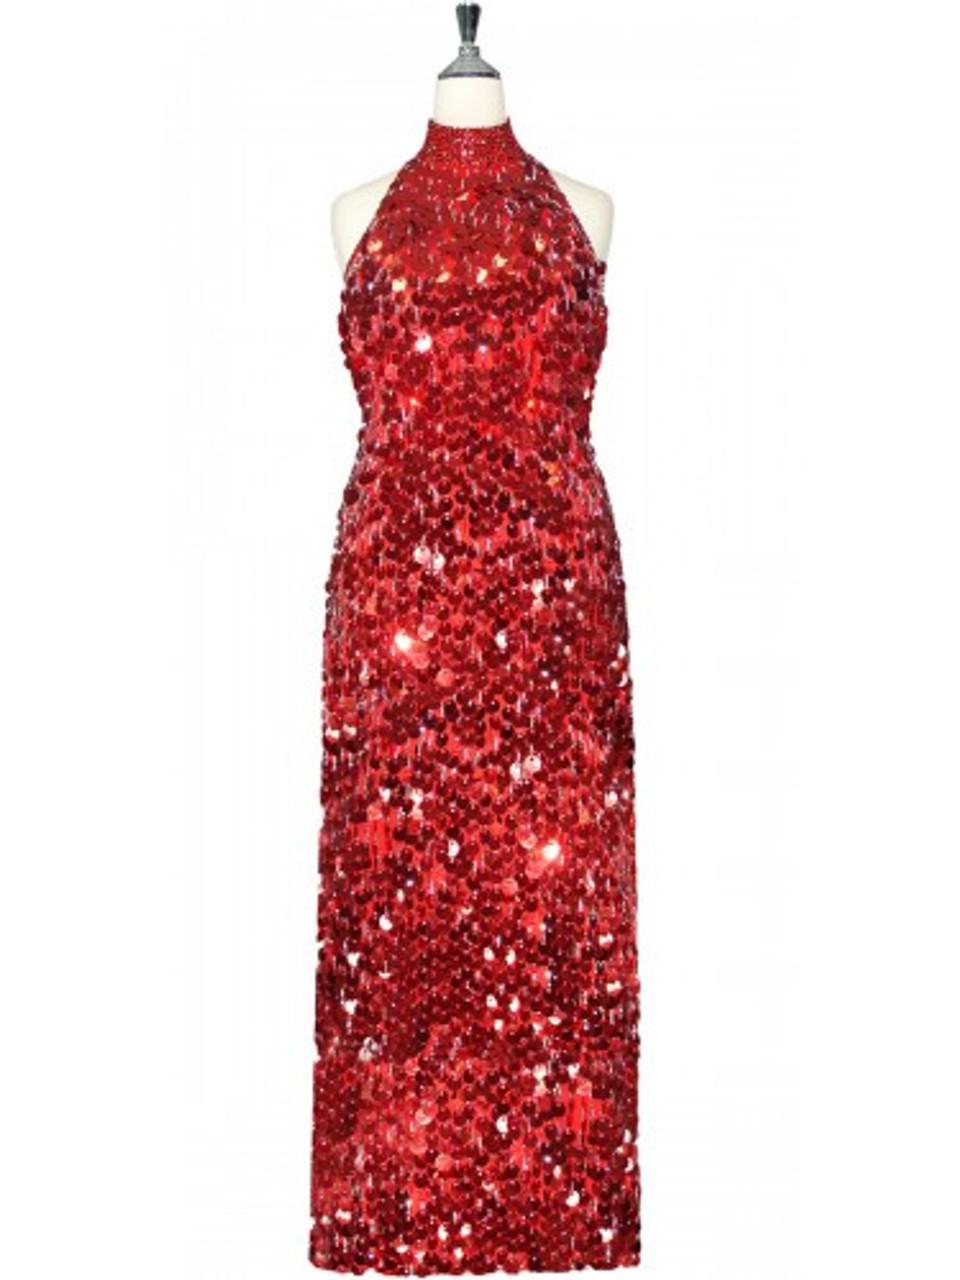 a2b3c4398e53 Long Chinese Collar Dress | Handmade | Paillette Sequin Spangles | Metallic  Red | SequinQueen